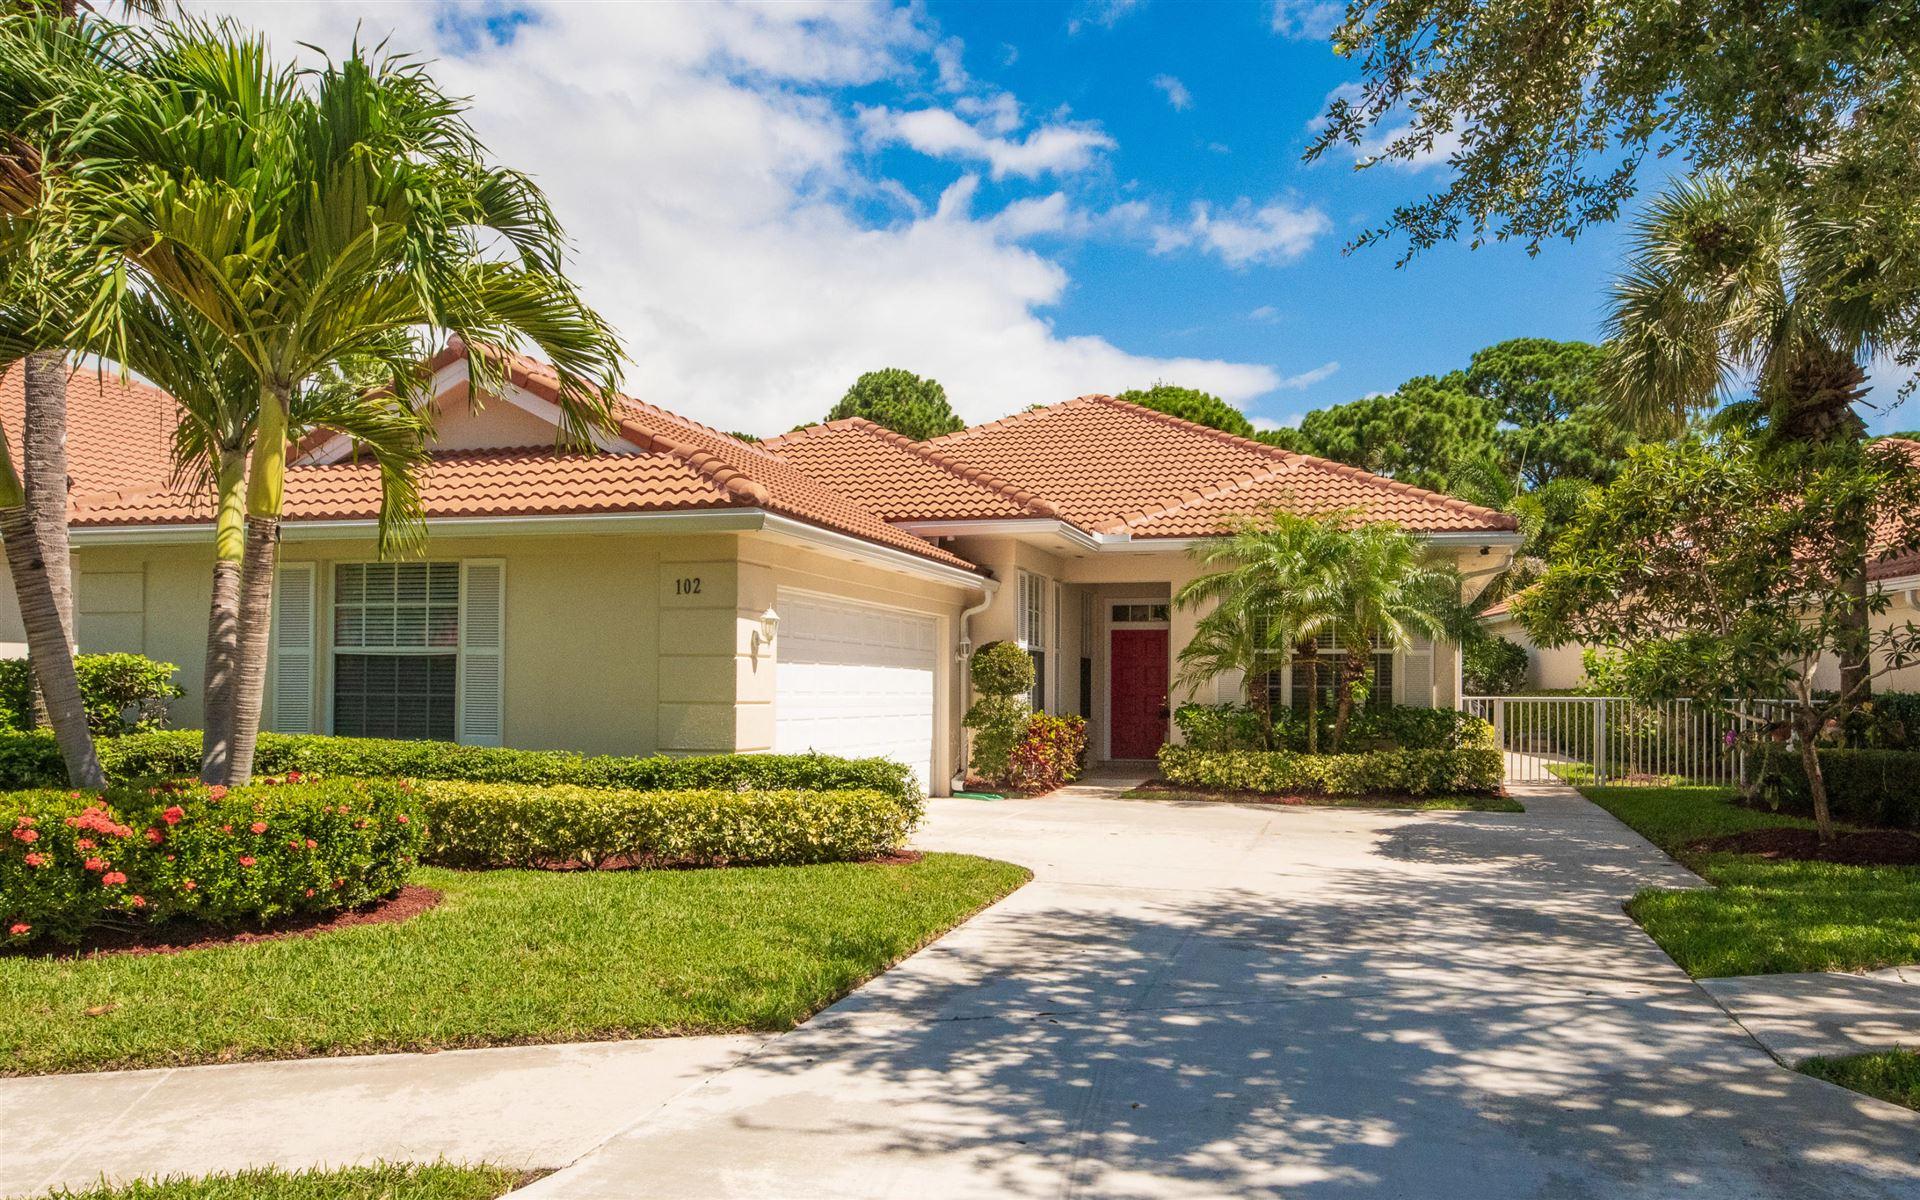 102 Lost Bridge Drive, Palm Beach Gardens, FL 33410 - #: RX-10629826